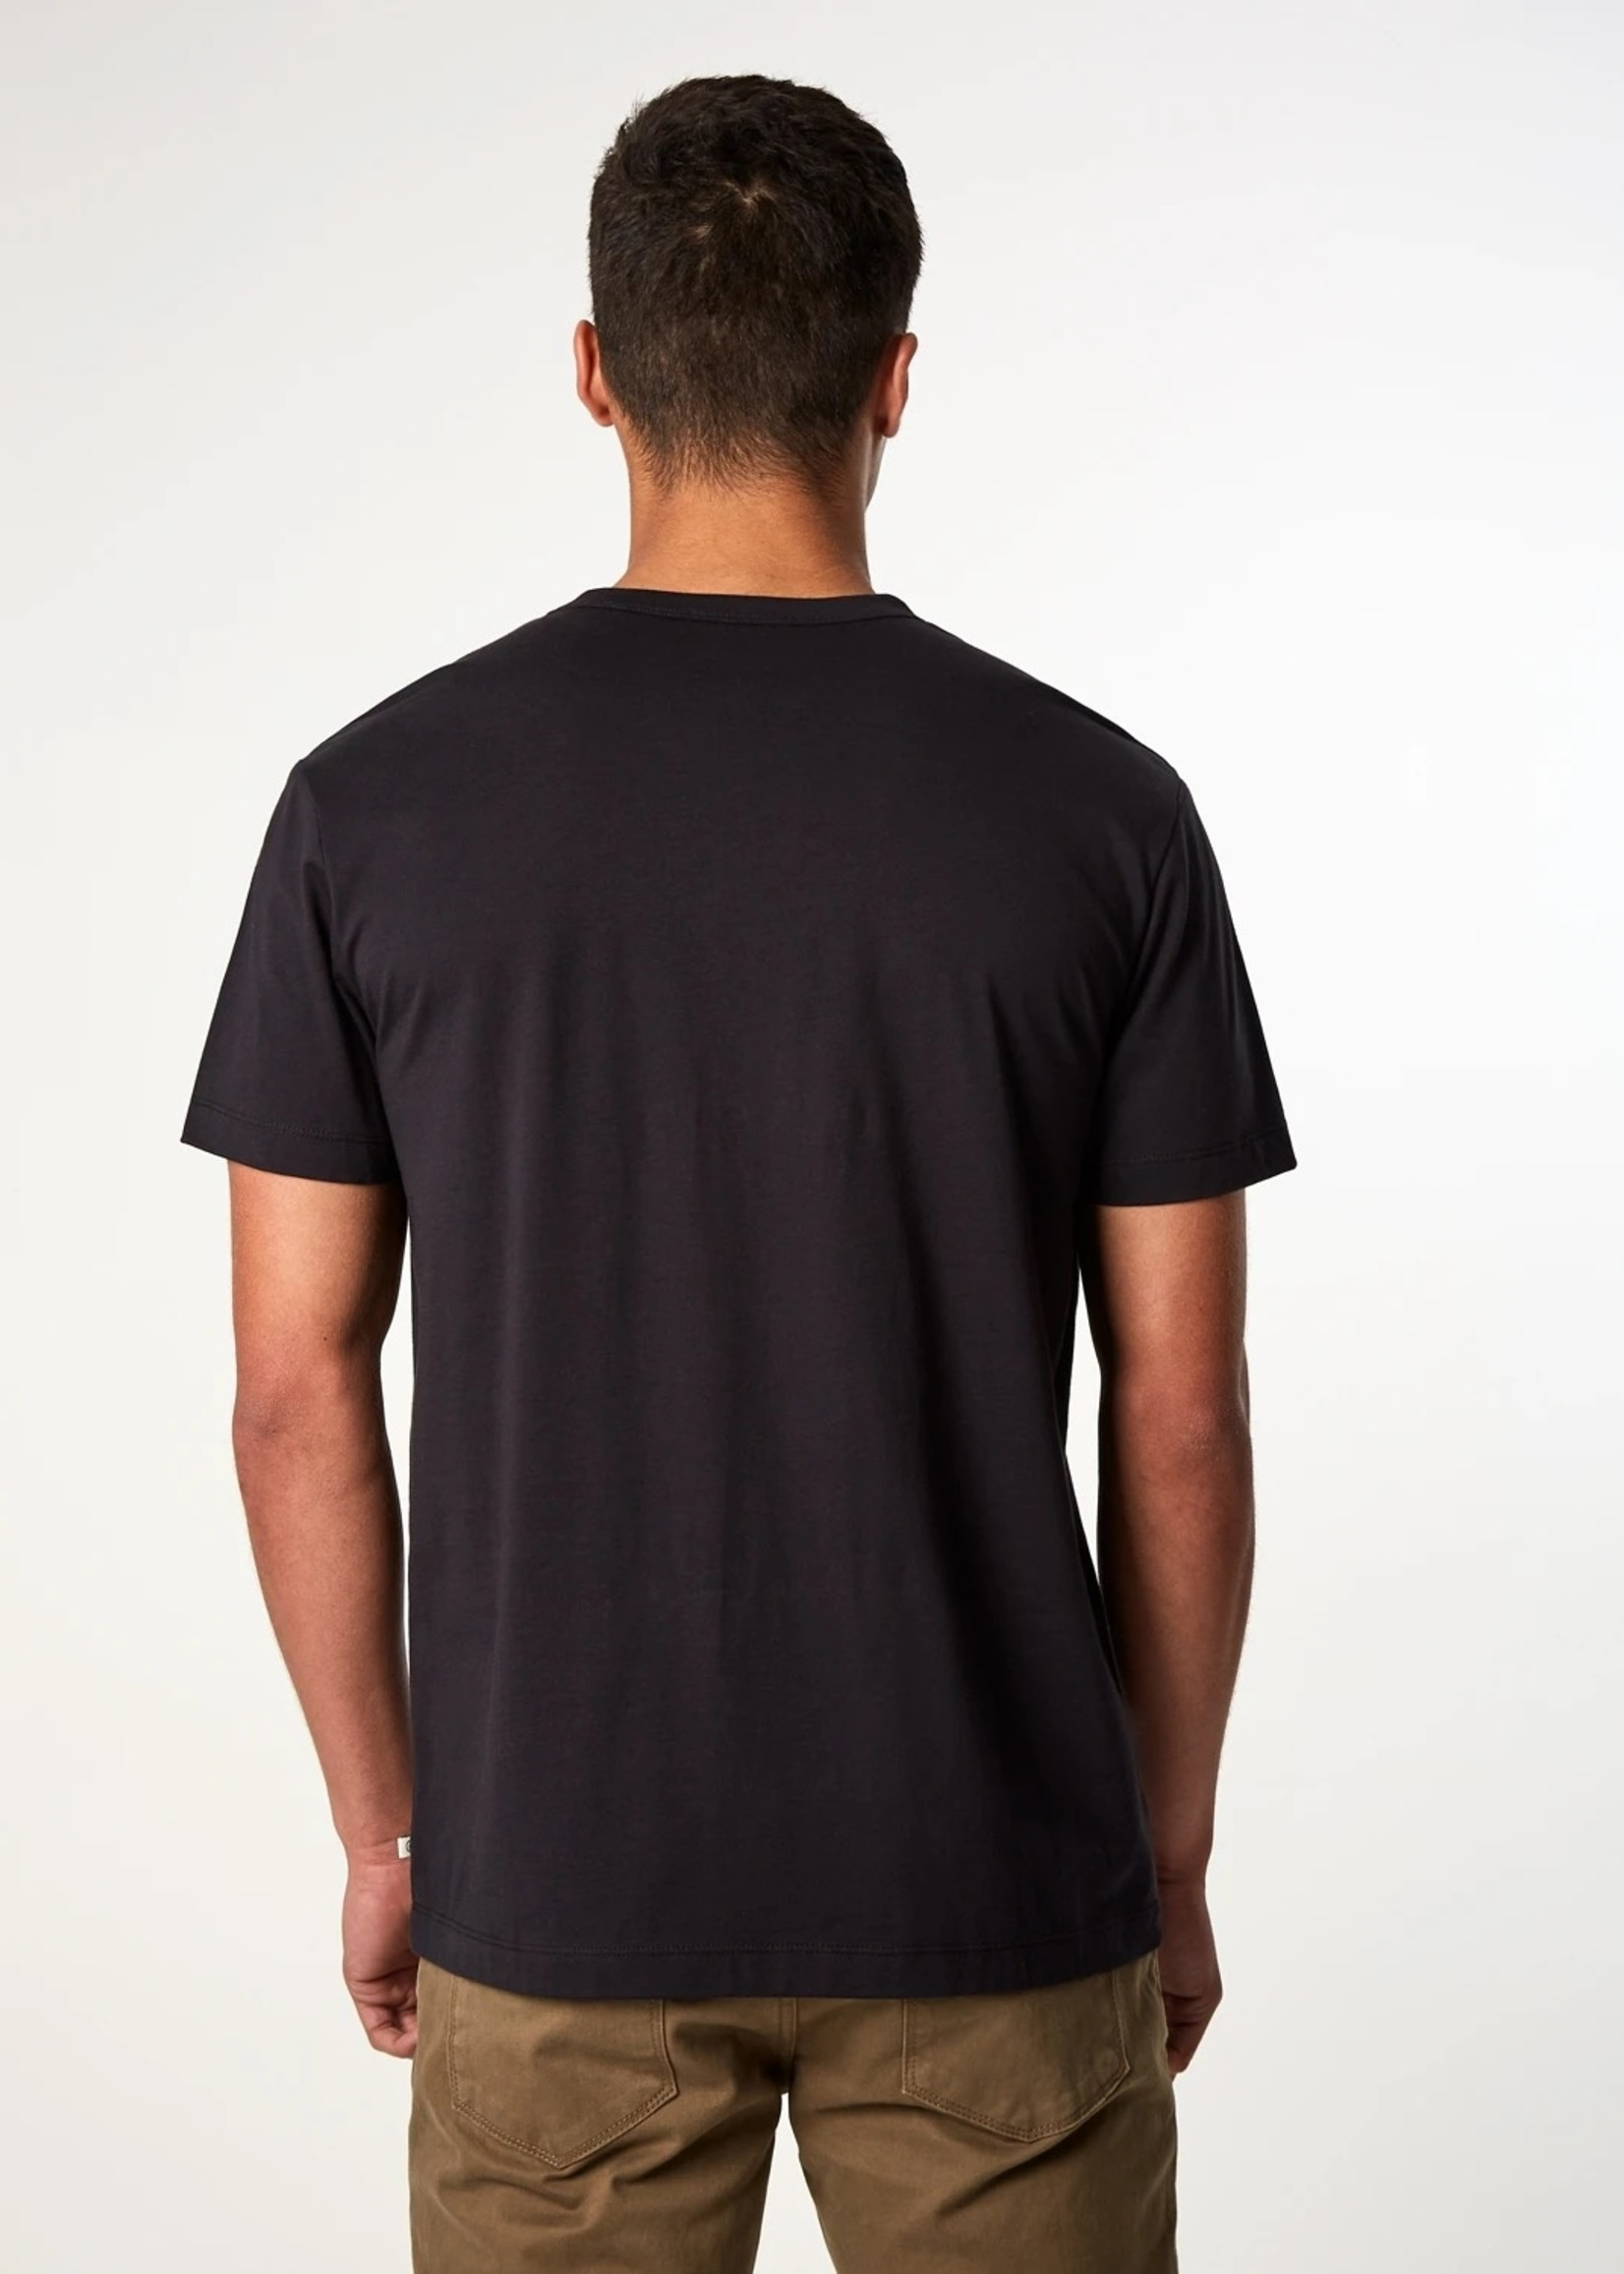 7 Diamonds Iqonicq Supima T-Shirt- Black